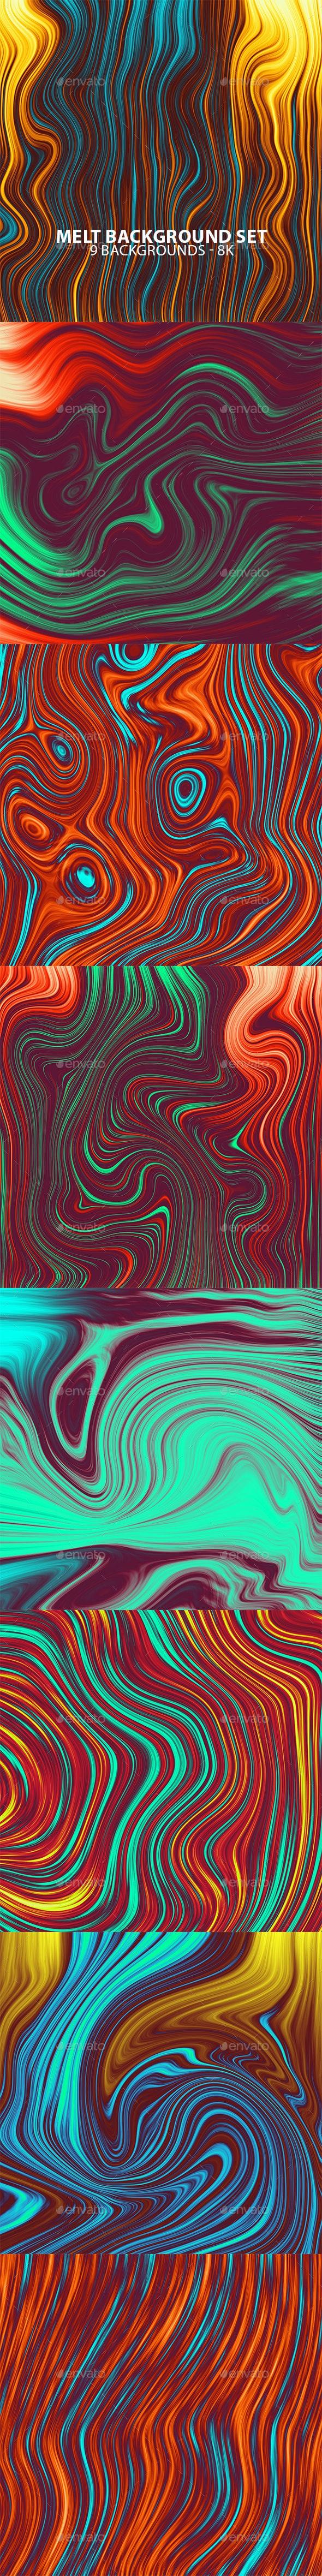 Melt Background Set - Abstract Backgrounds